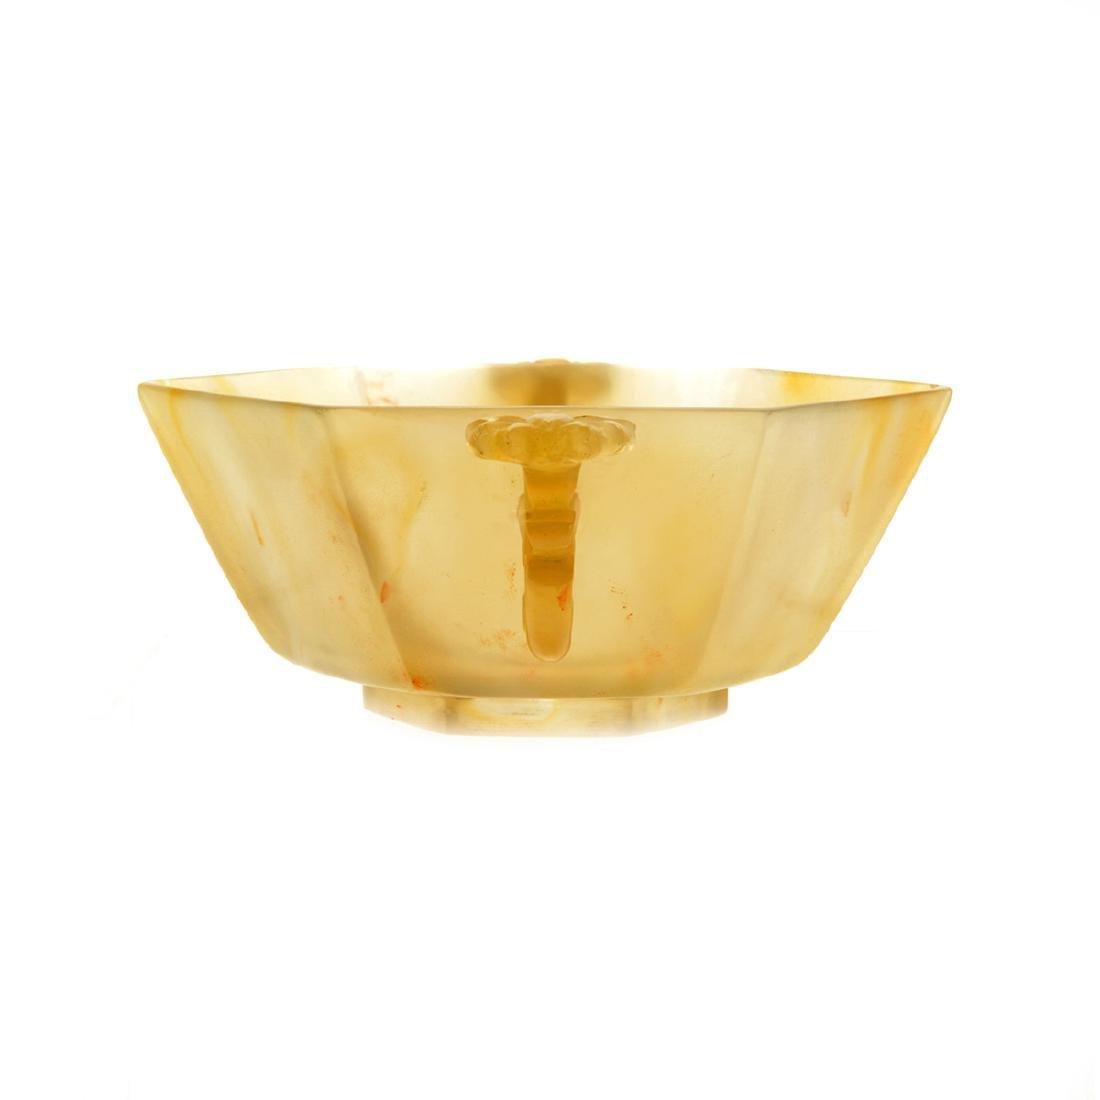 Agate Libation Cup, Yongzheng Mark - 2